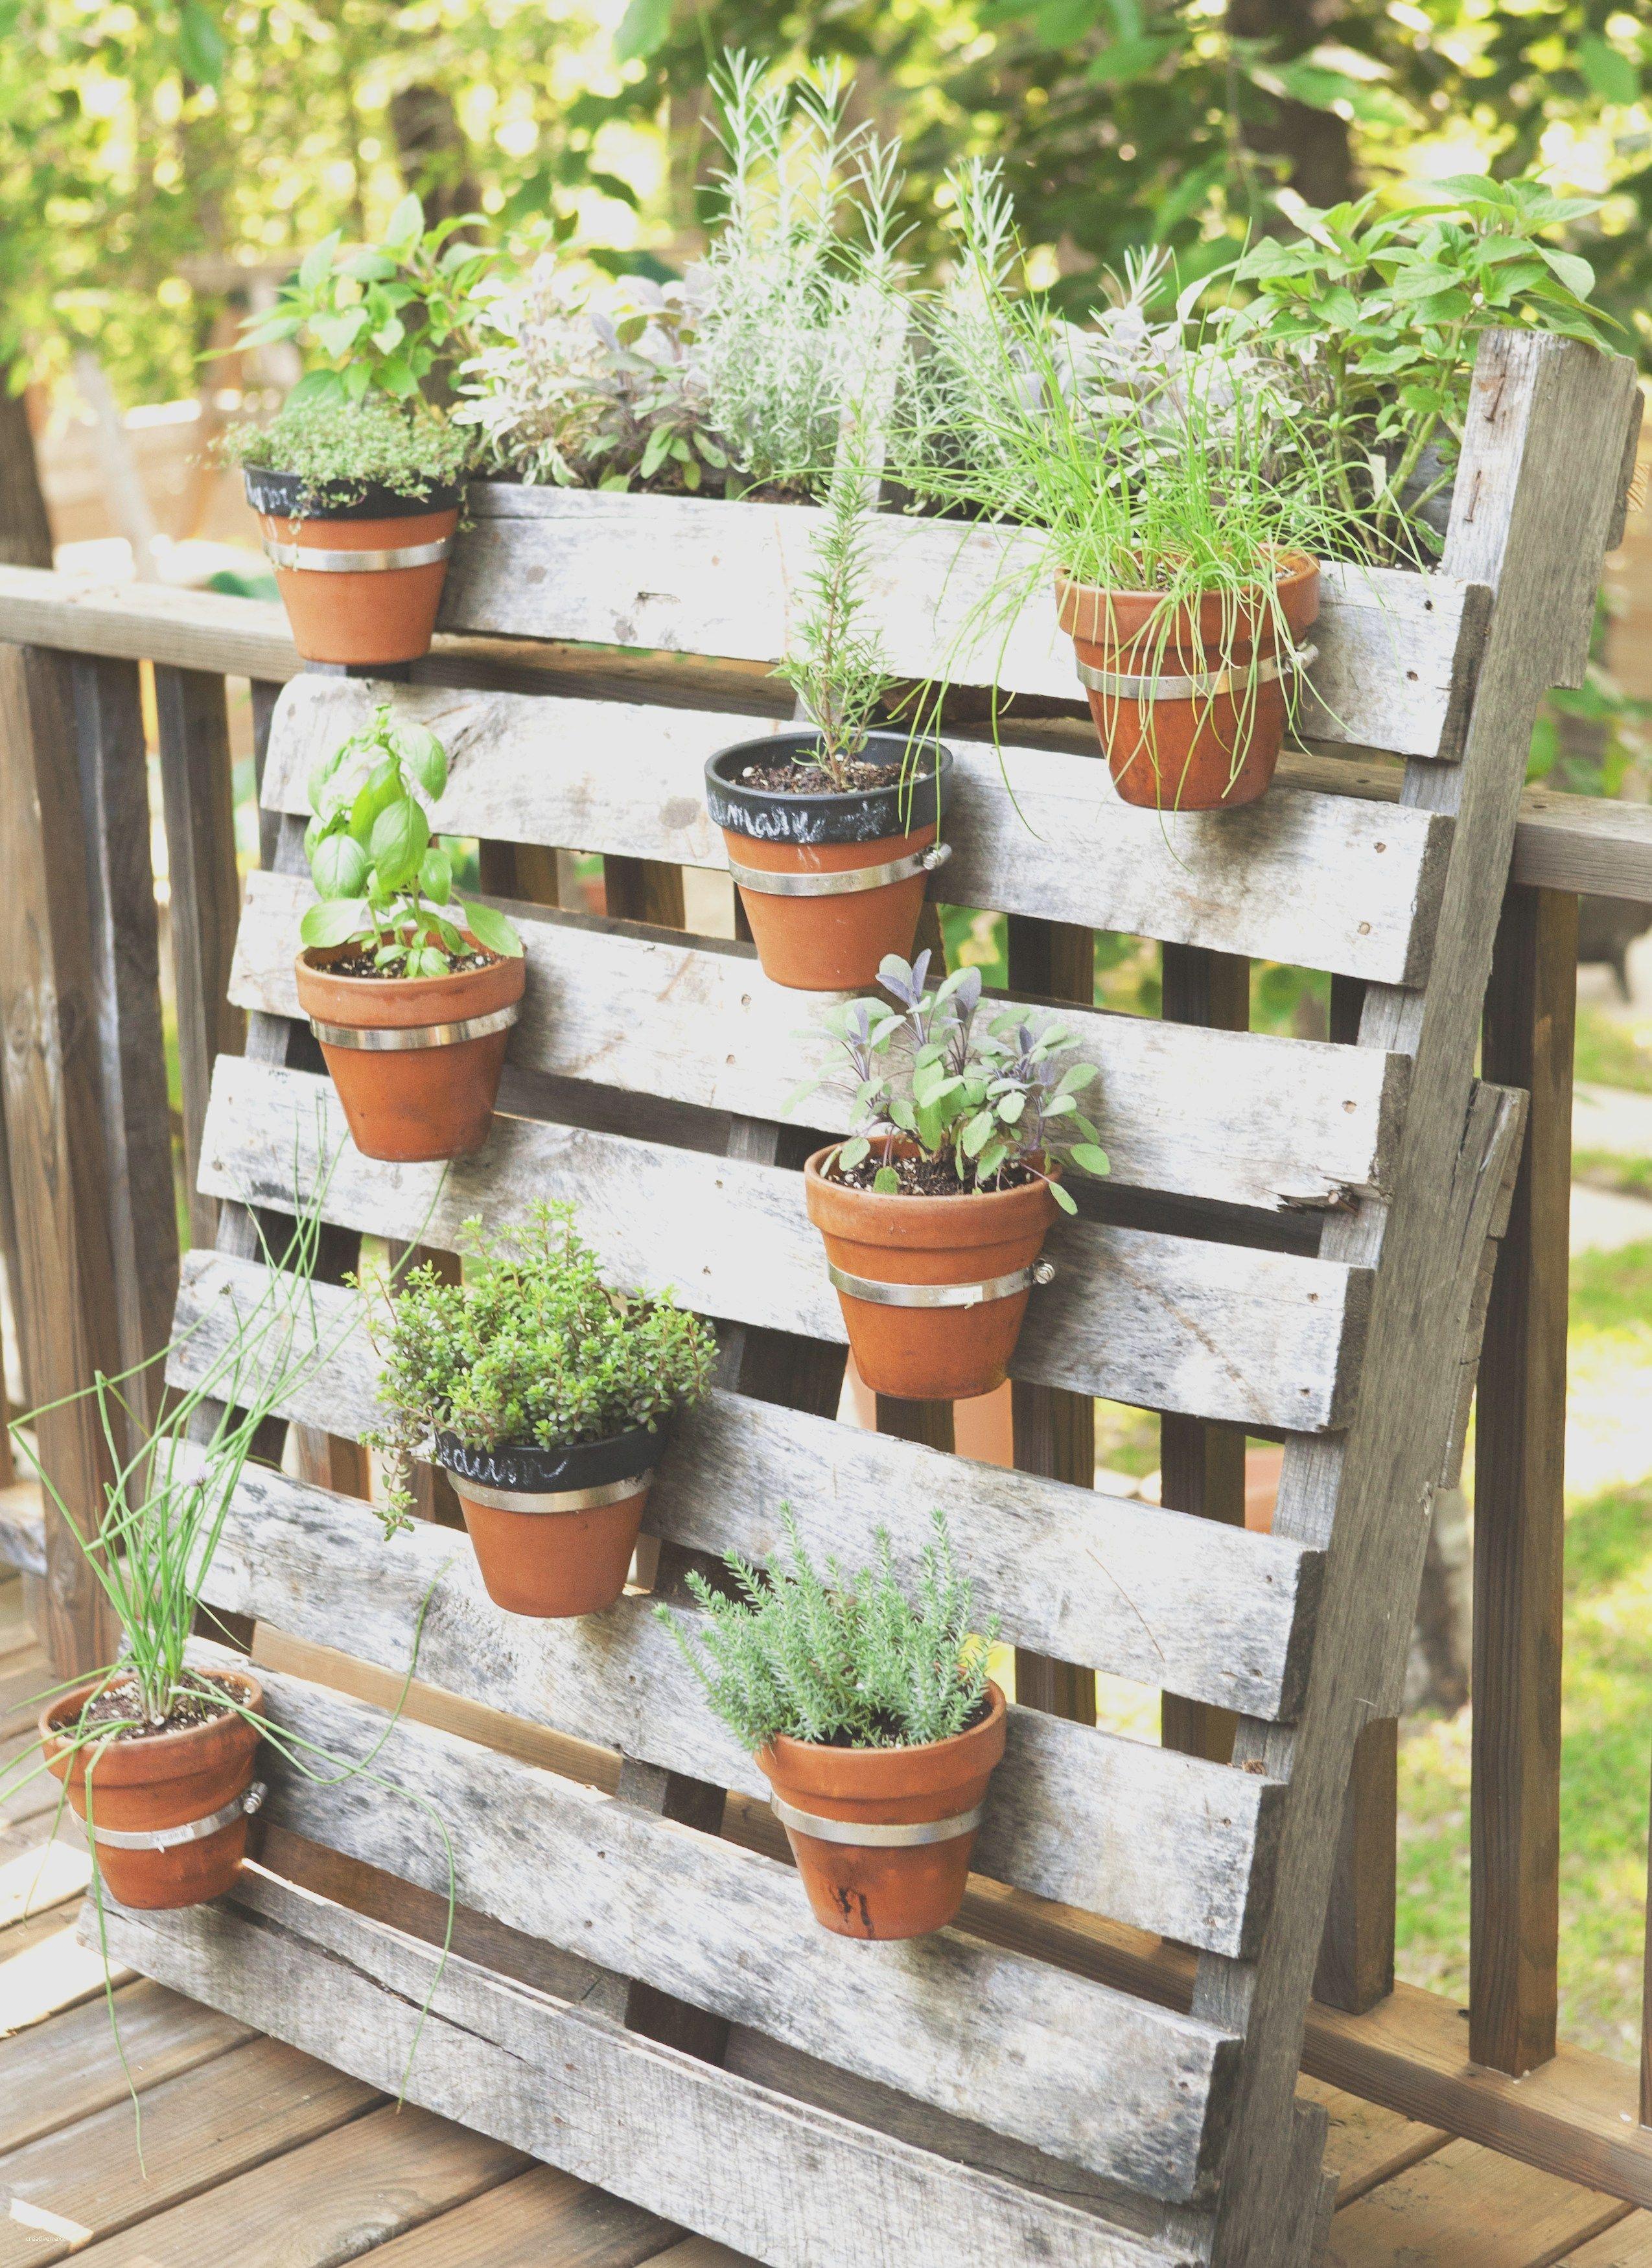 55 Cute garden ideas bloxburg #bloxburg #garden #ideas ... on Cute Small Backyard Ideas id=47230